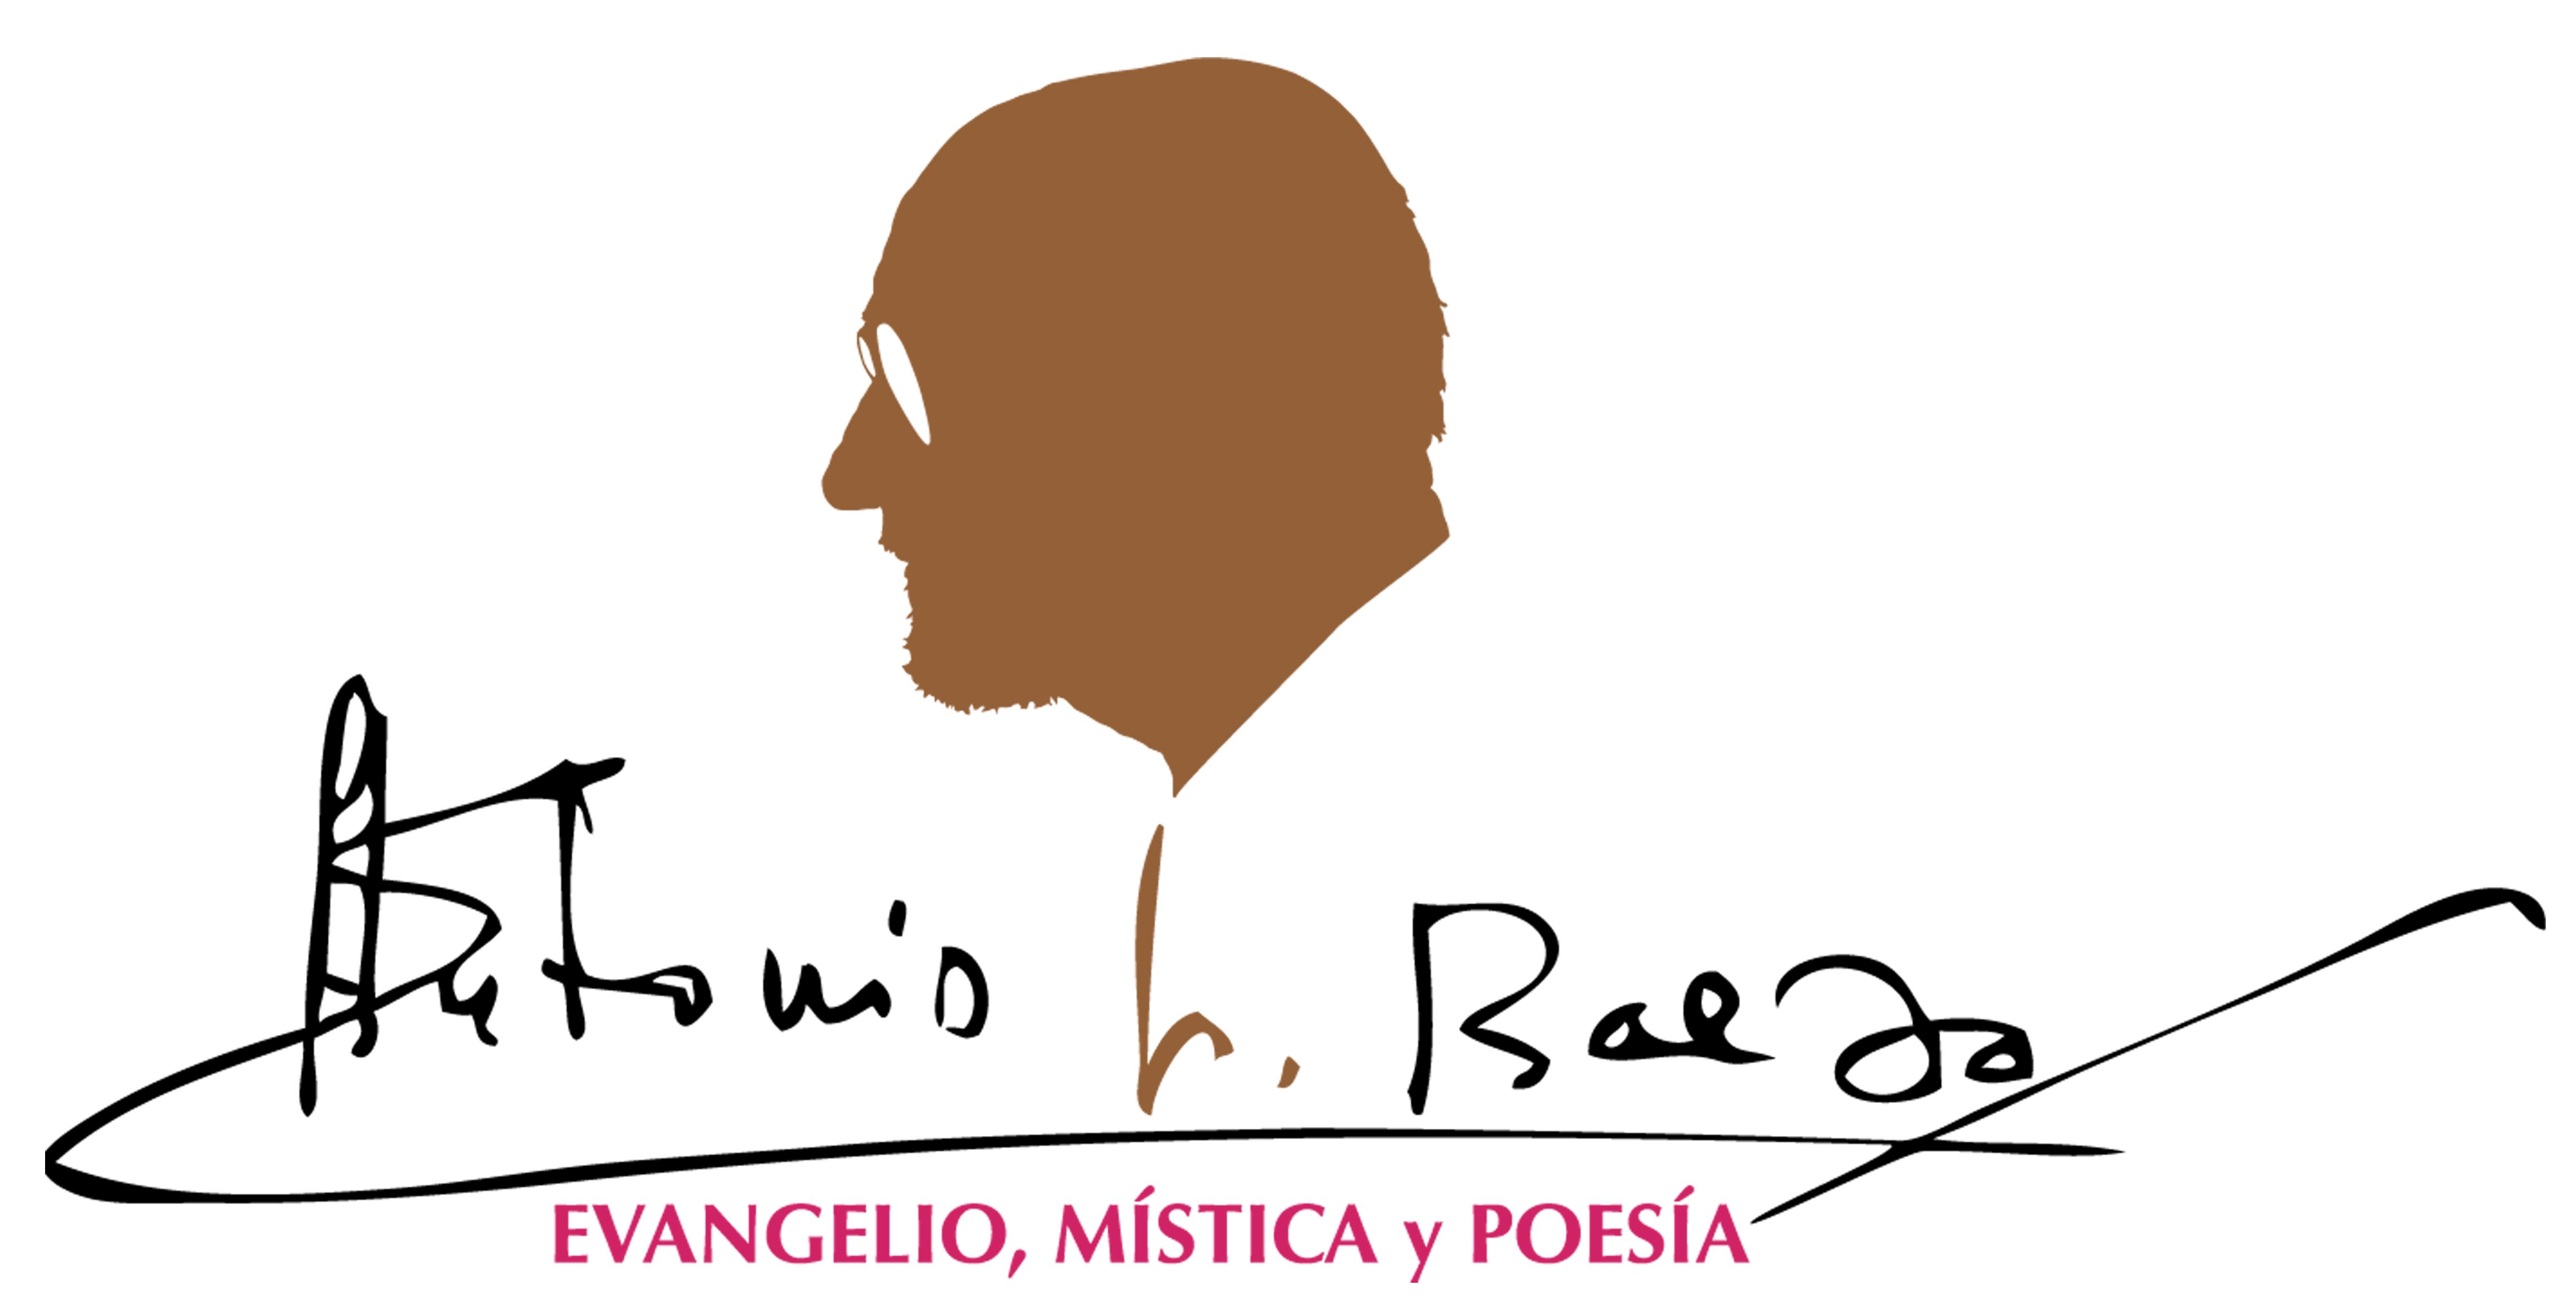 Antonio Lopez Baeza